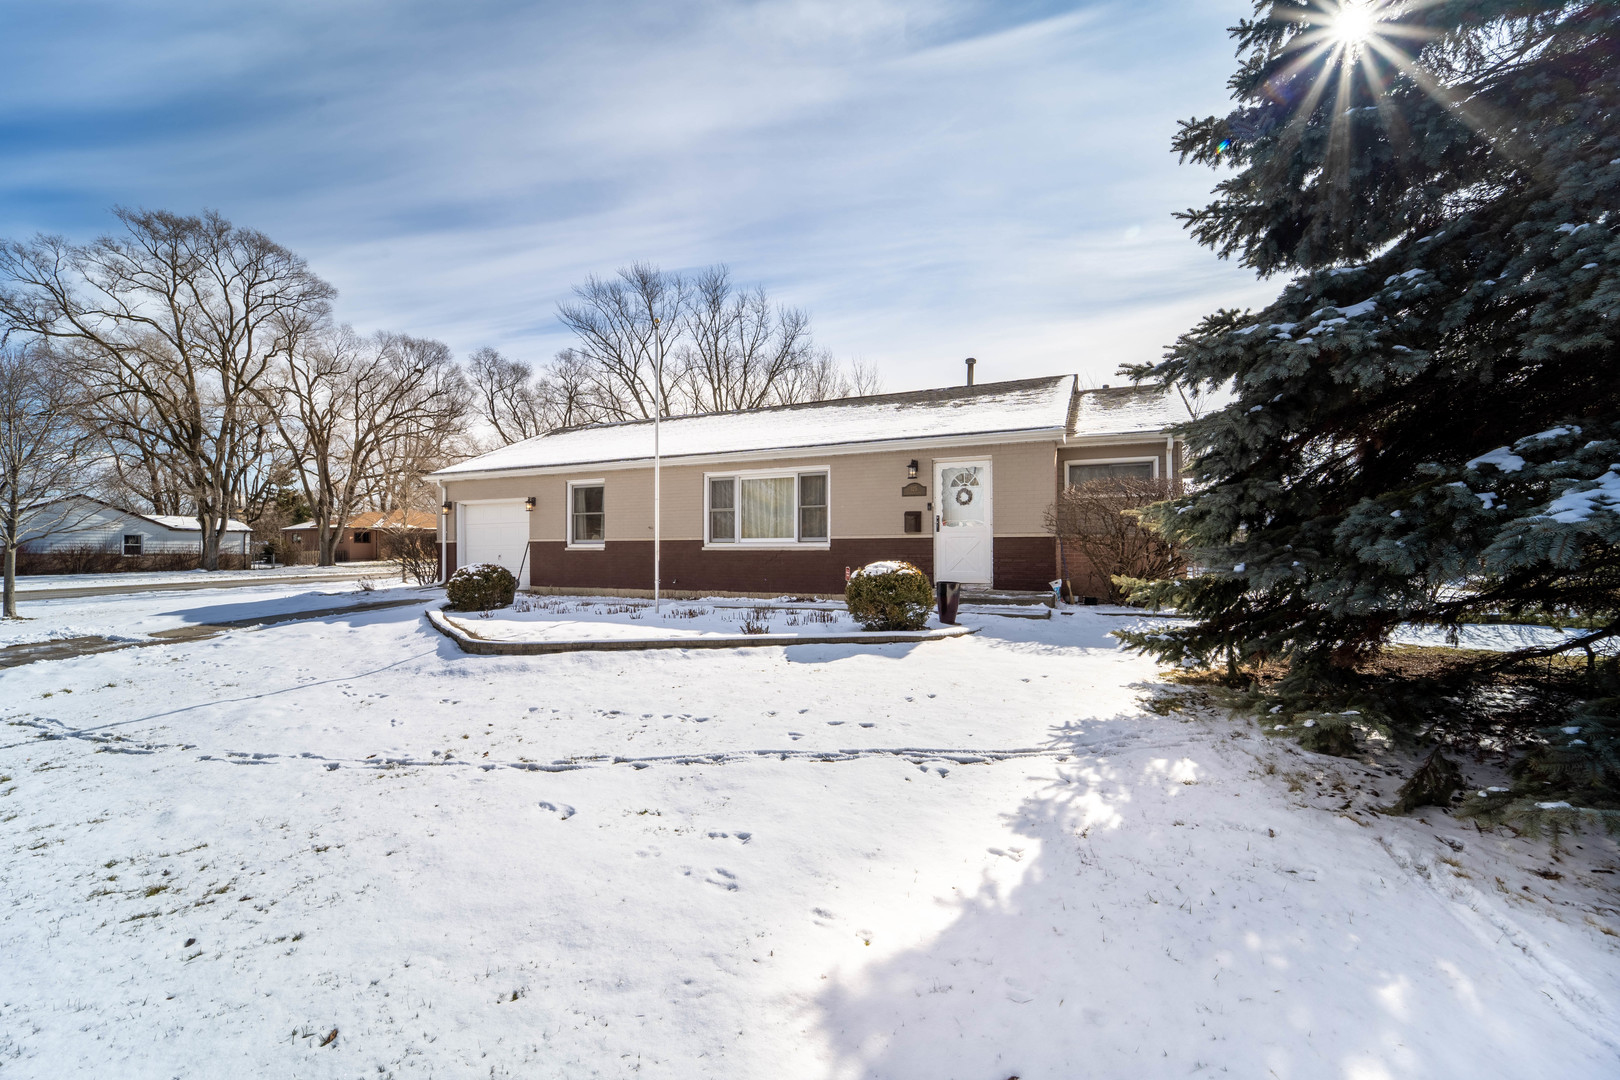 125 Chandler, Hoffman Estates, Illinois, 60169